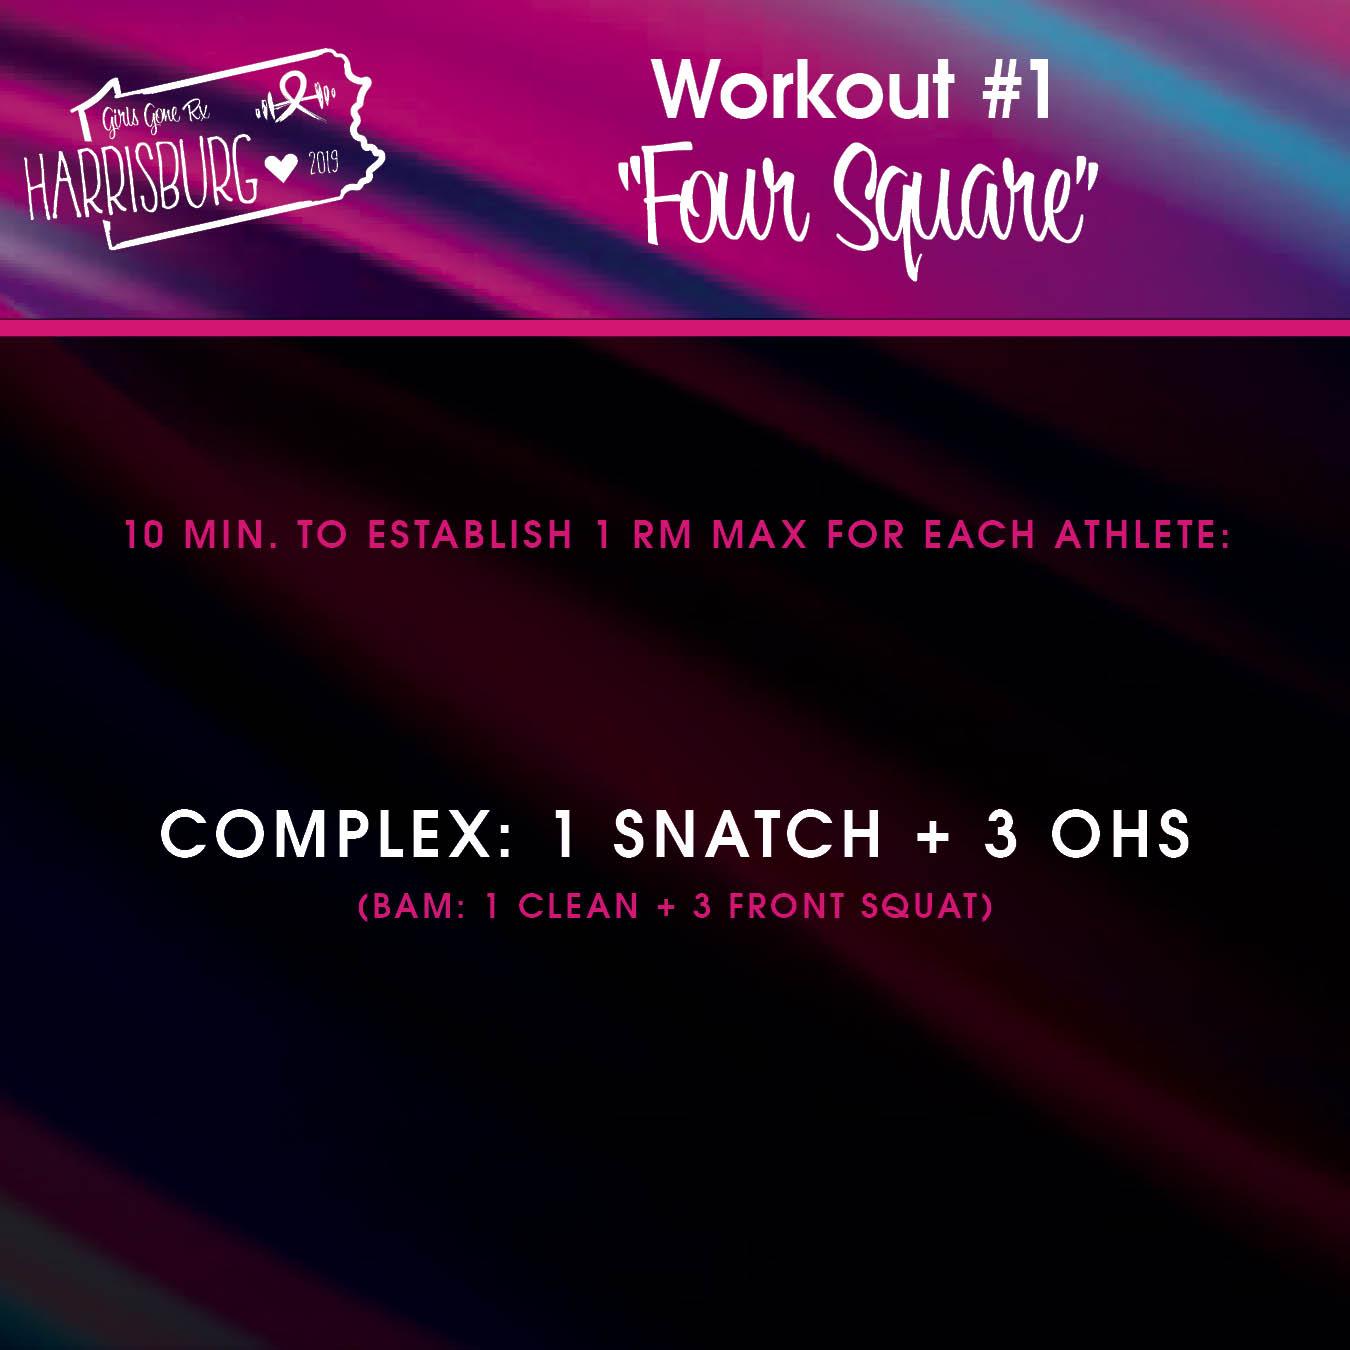 Workouts_Harrisburg_2019.jpg